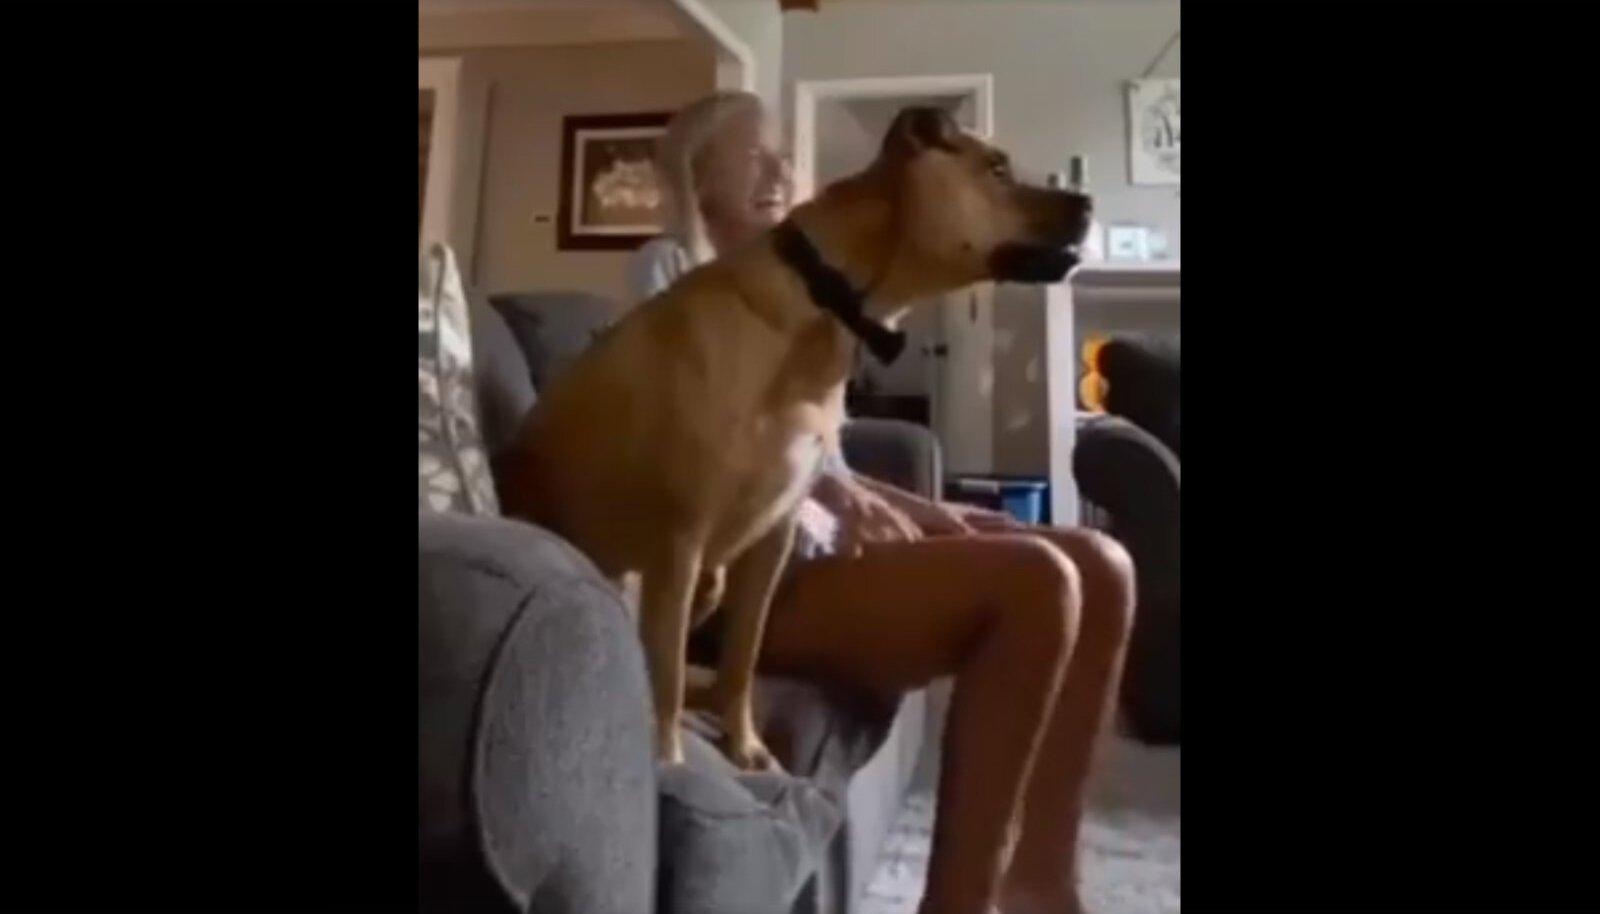 Koer jalgpalli vaatamas